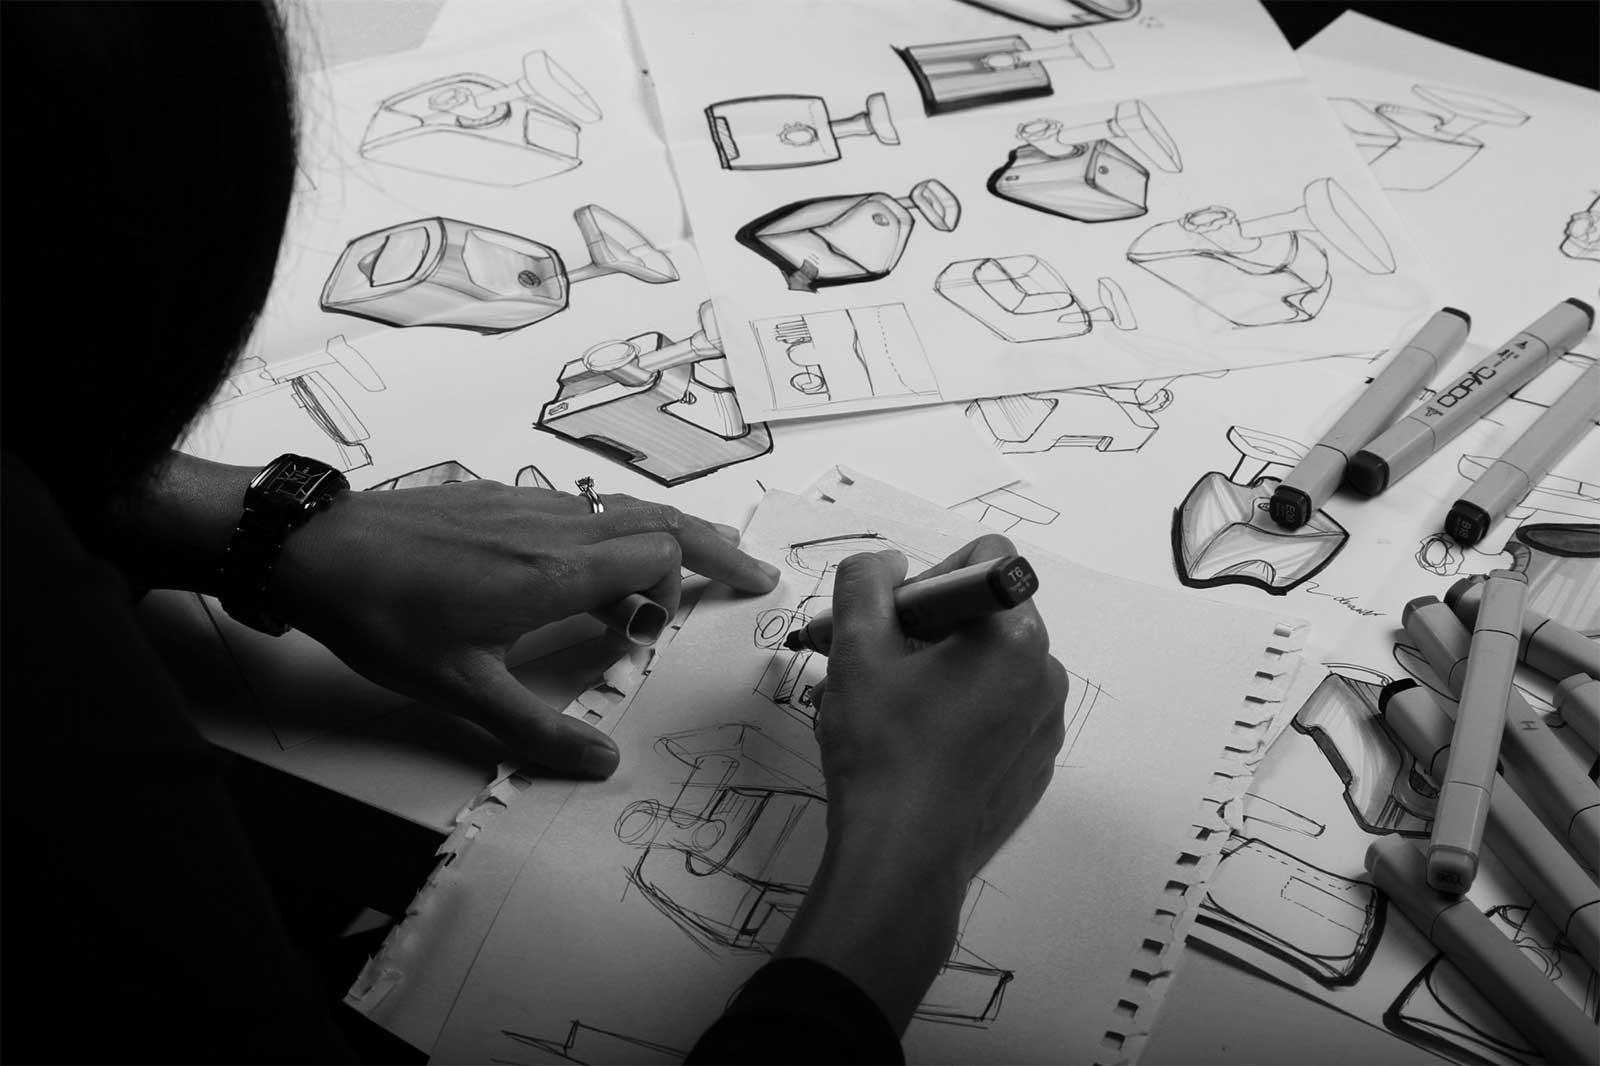 Design-Filter-Product-Design-home-bw